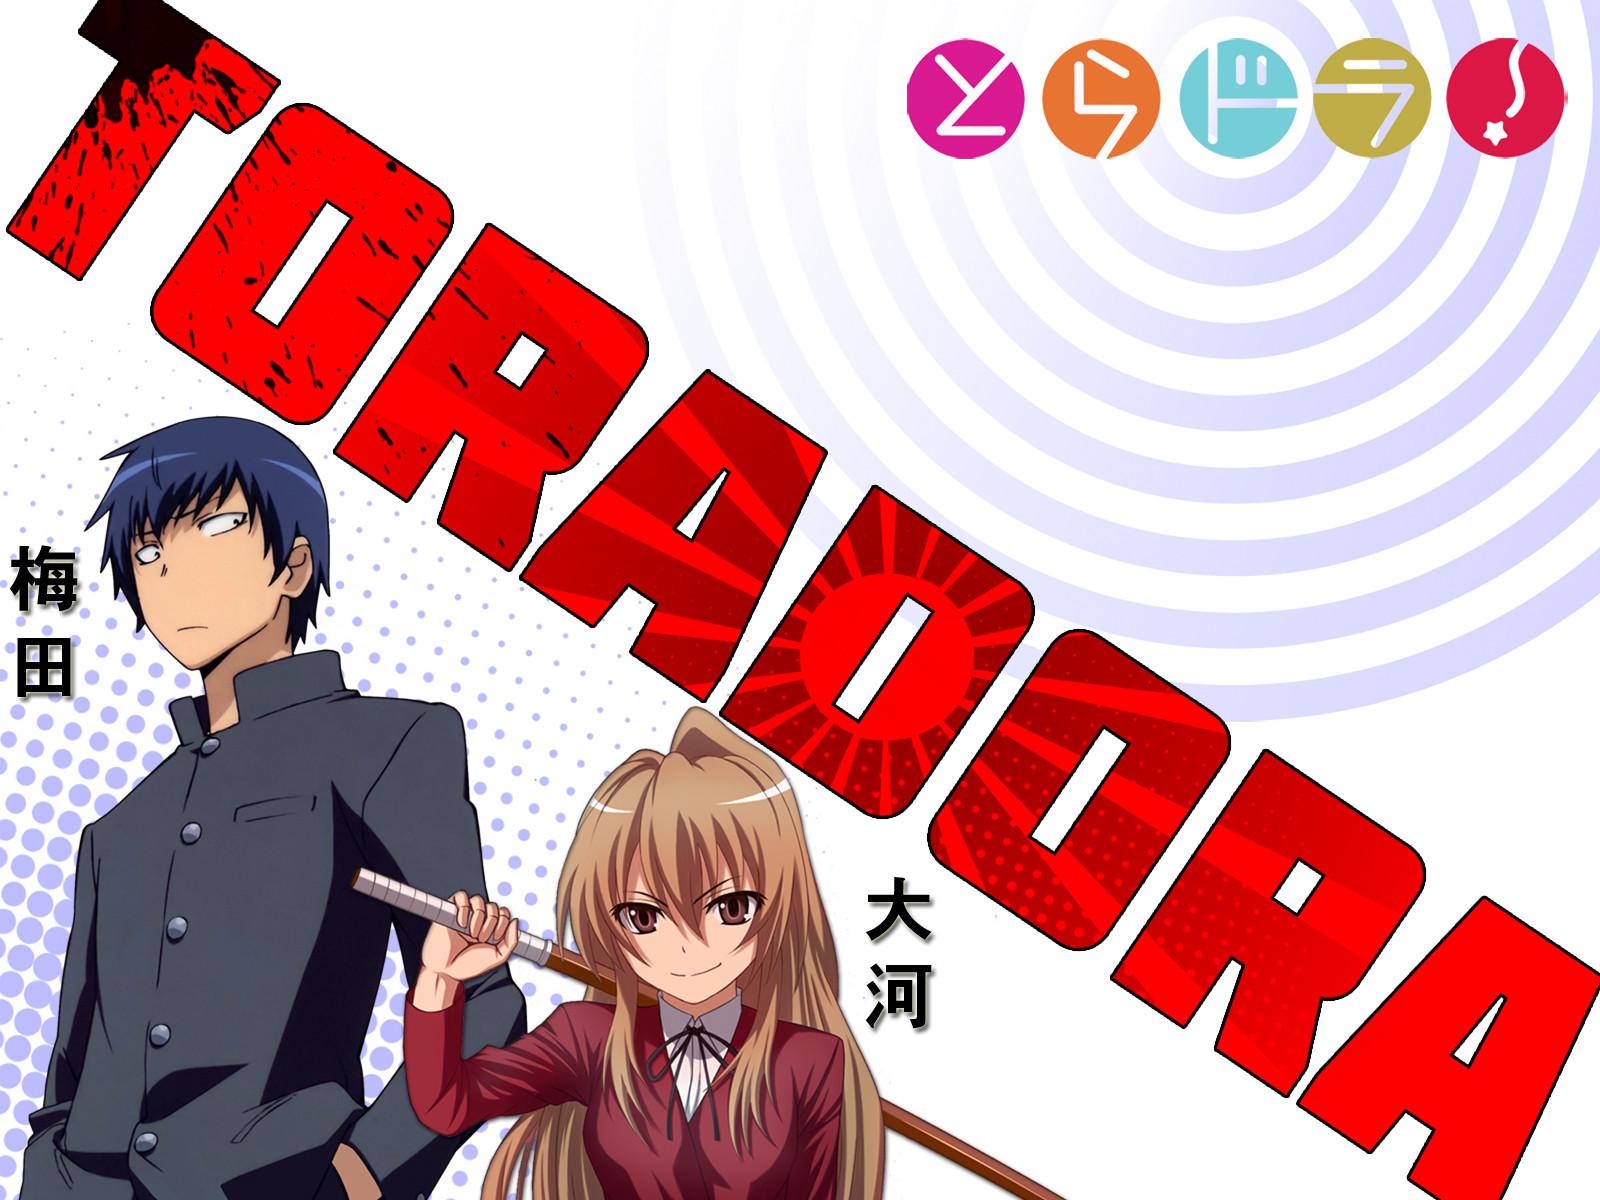 Toradora wallpaper and background image 1600x1200 id - Toradora anime wallpaper ...